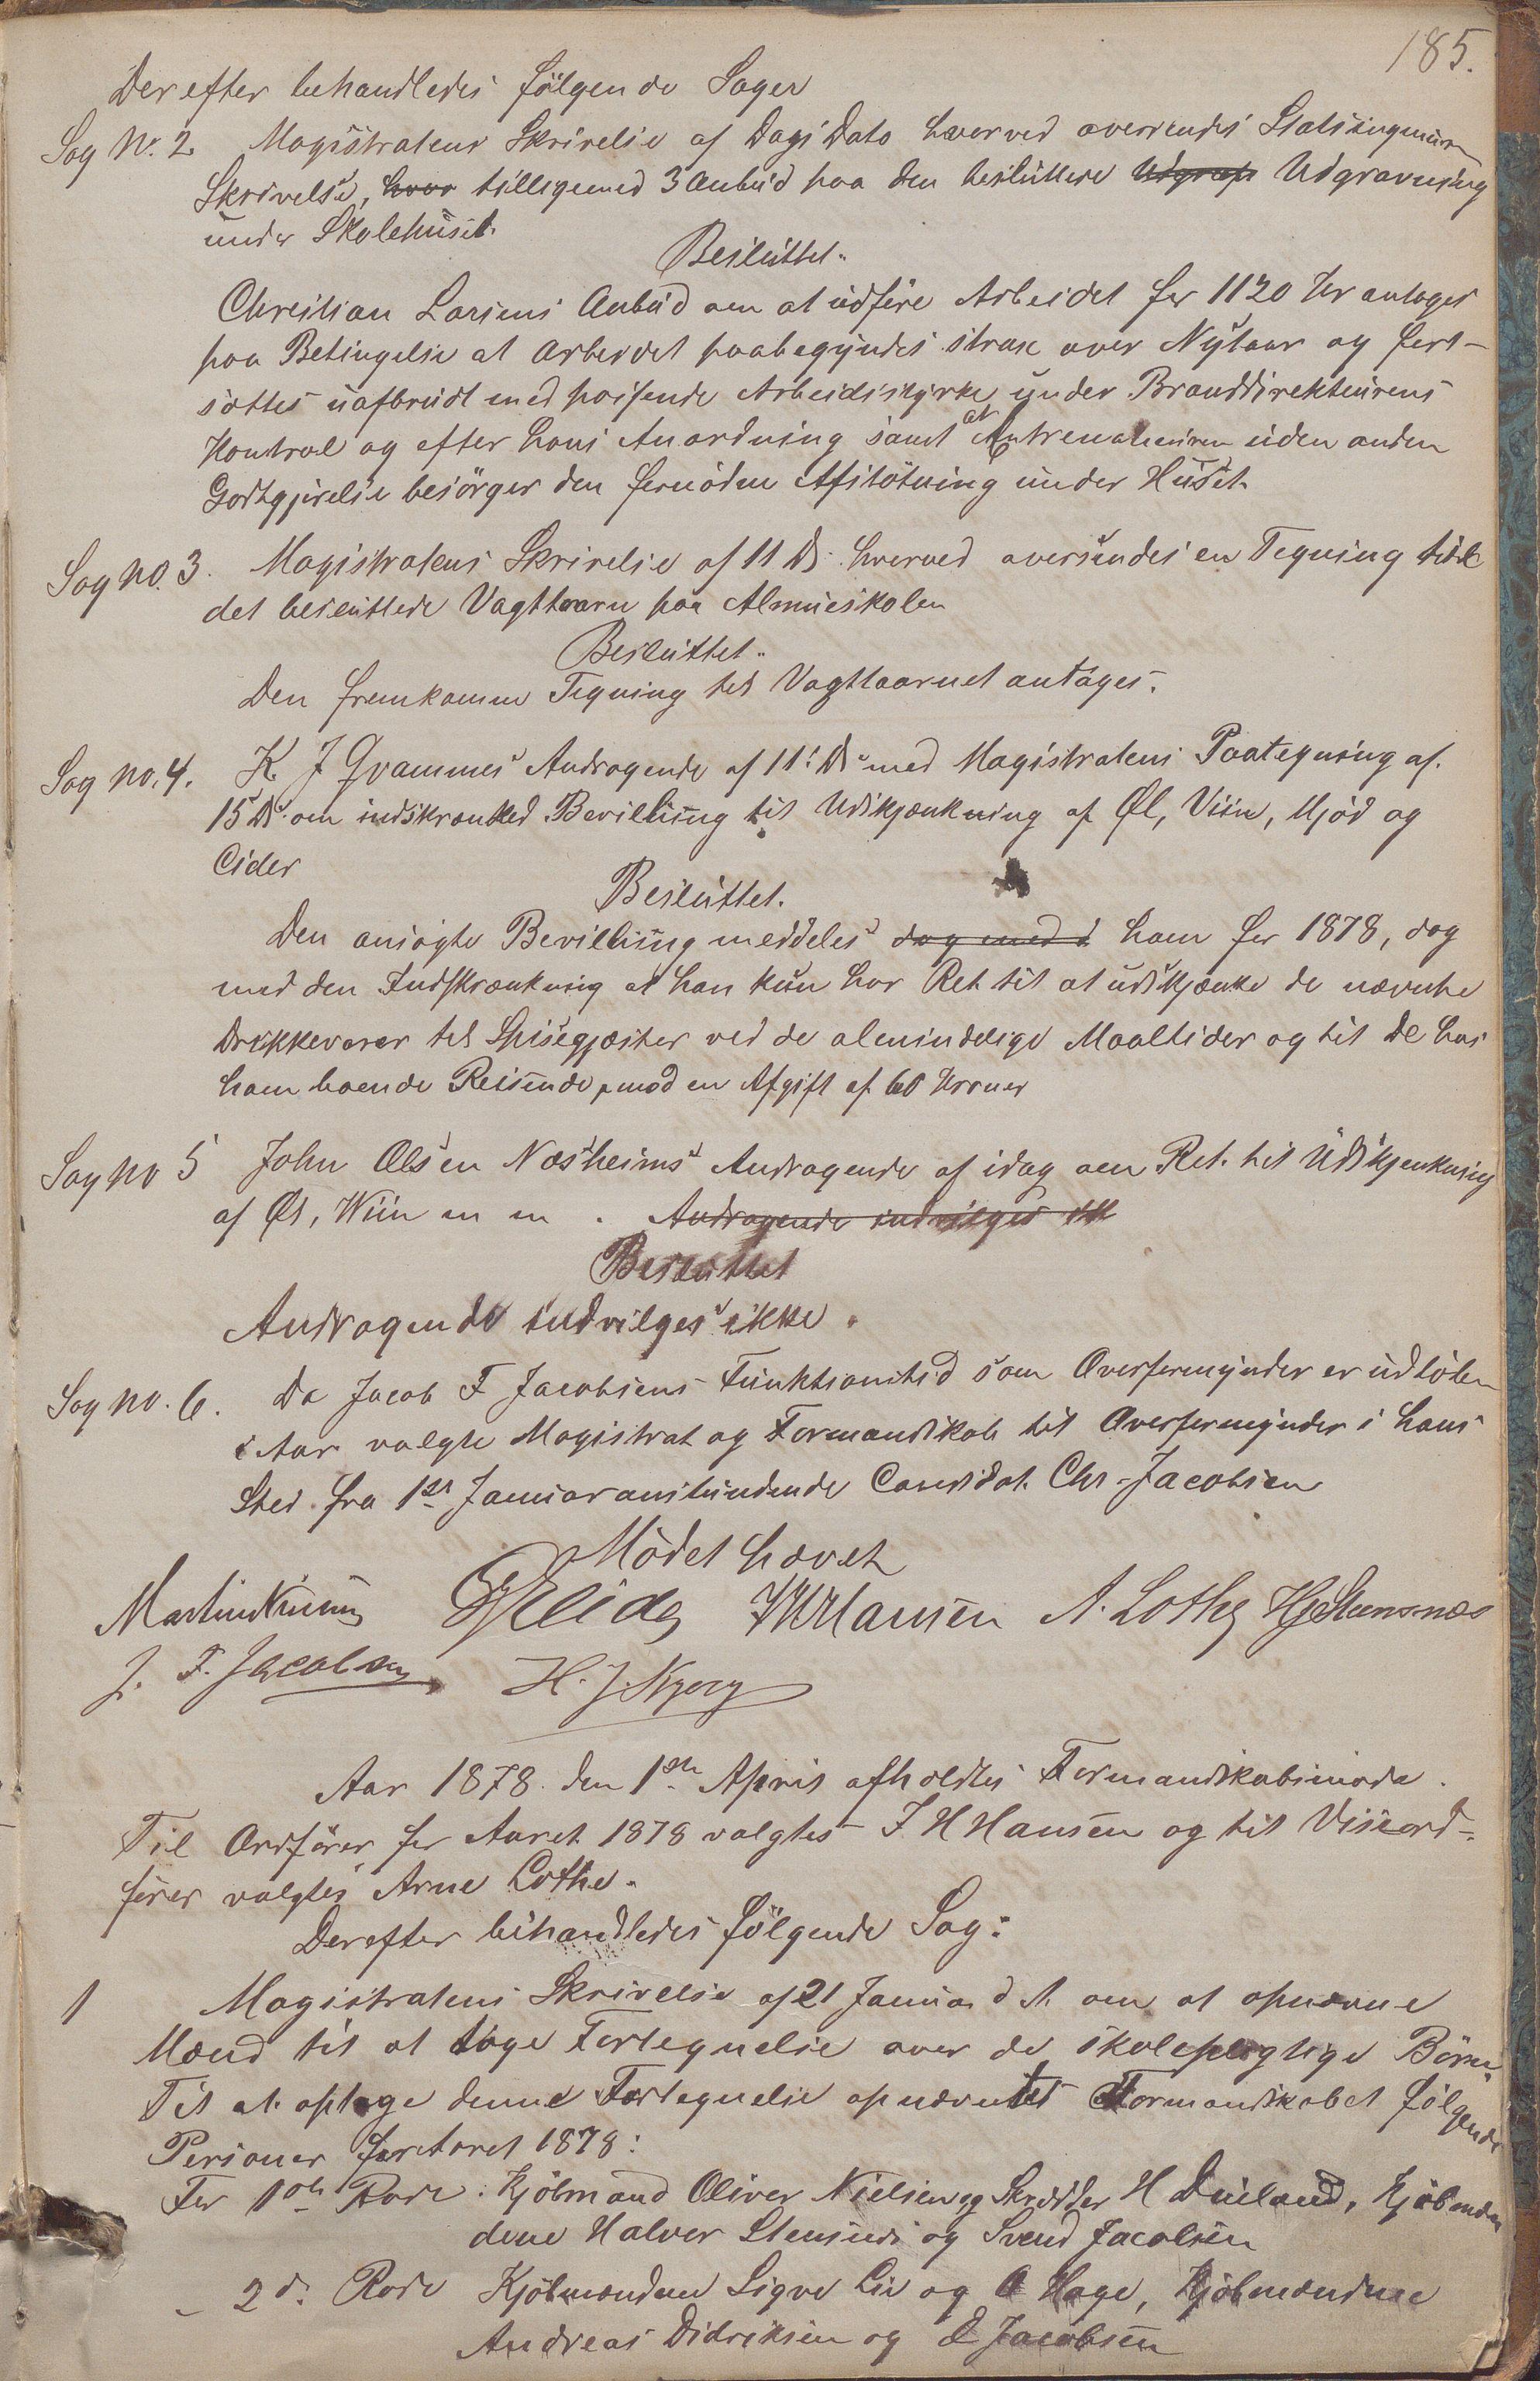 IKAR, Haugesund kommune - Formannskapet, 1866-1878, s. 185a